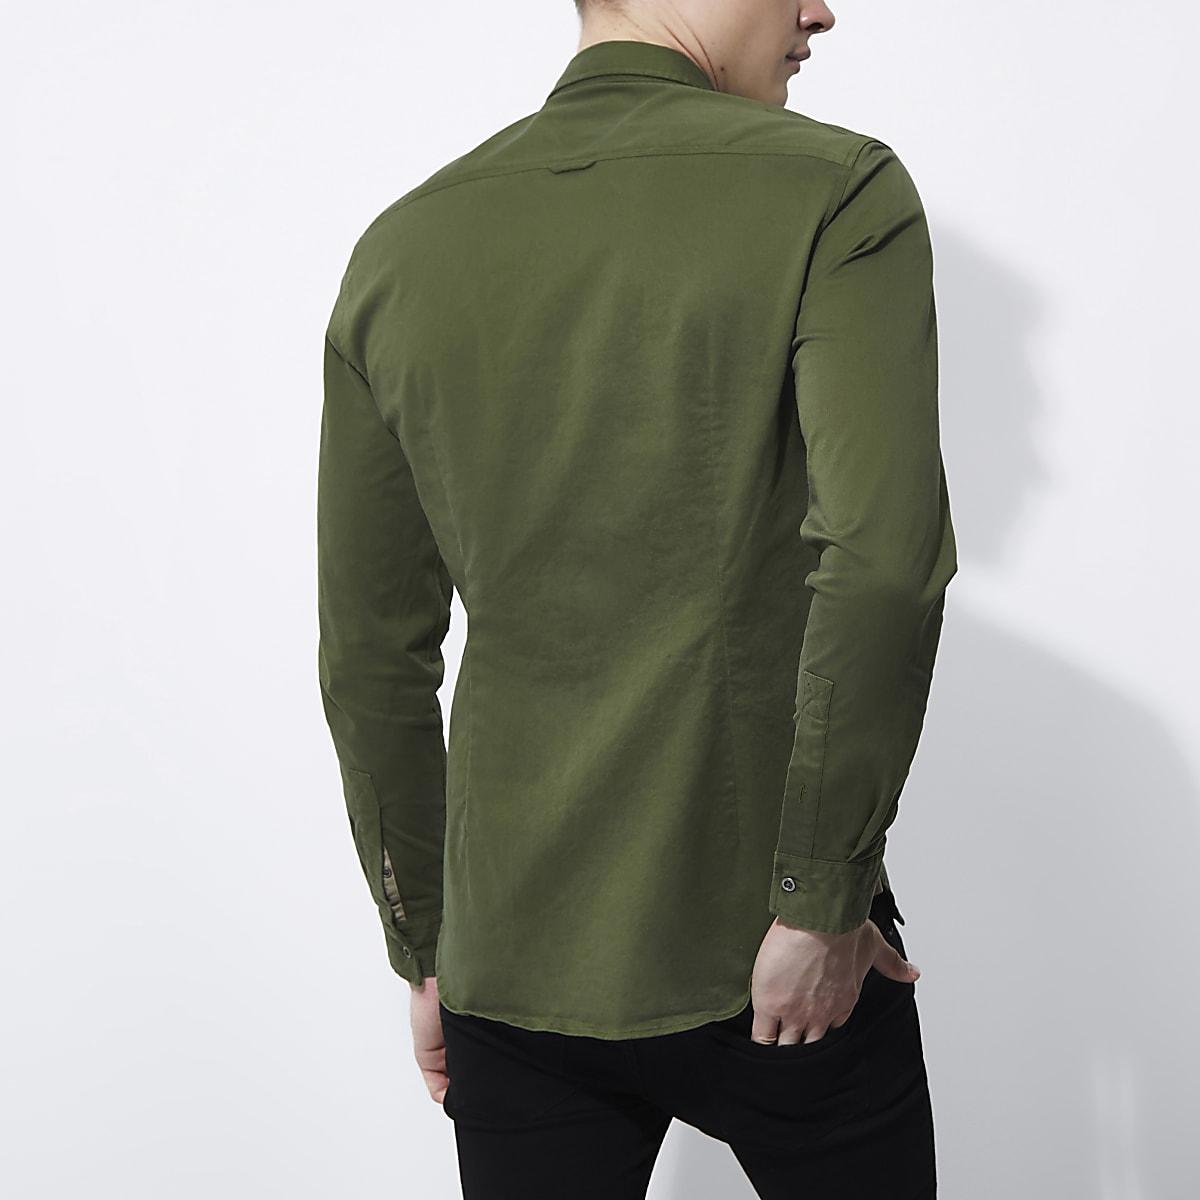 8363a1d0a Khaki green muscle fit military shirt - Long Sleeve Shirts - Shirts - men